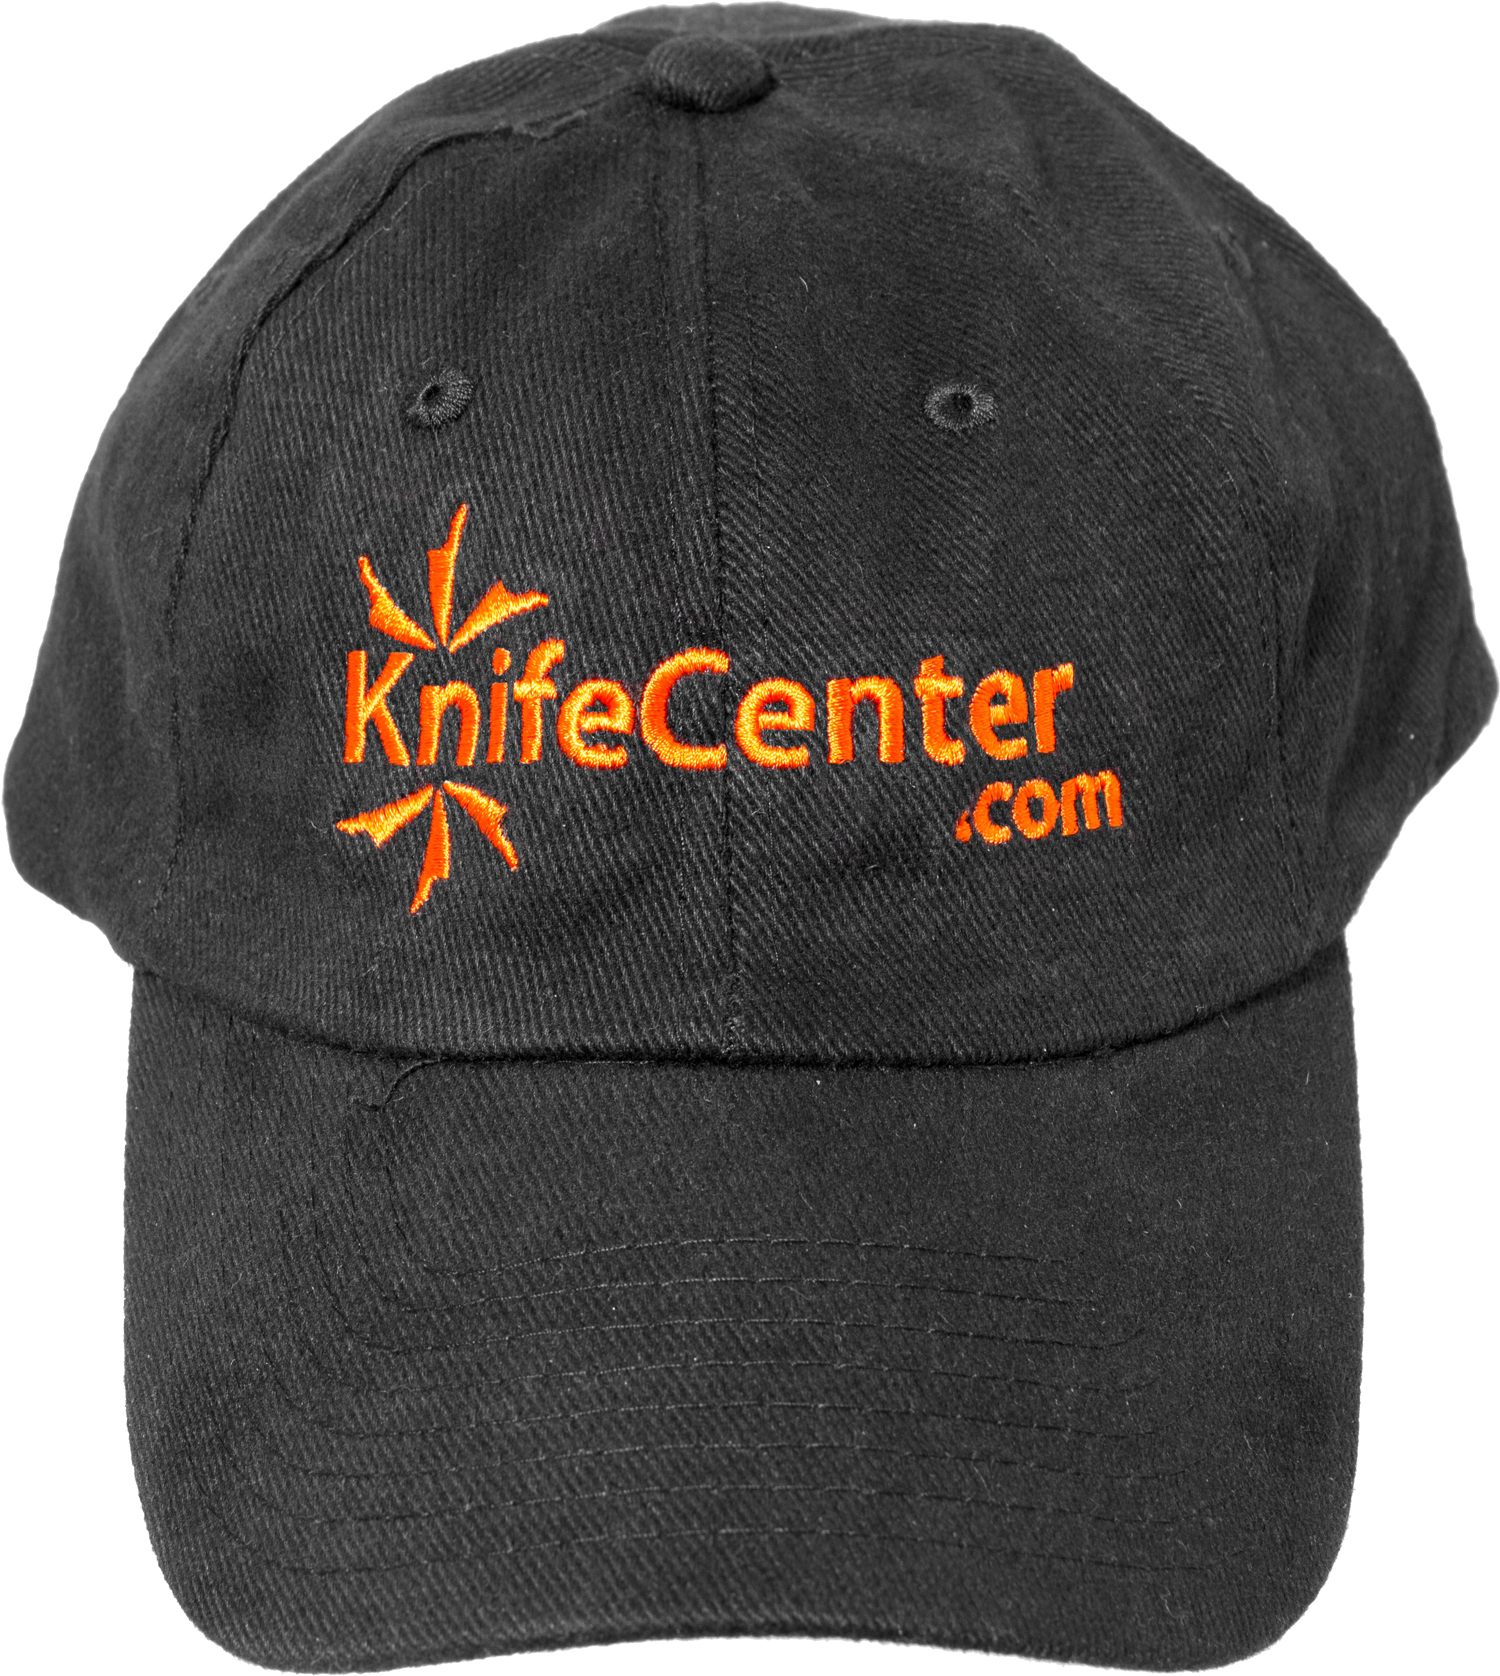 KnifeCenter.com Heavy Brushed Cotton Cap/Hat, Black